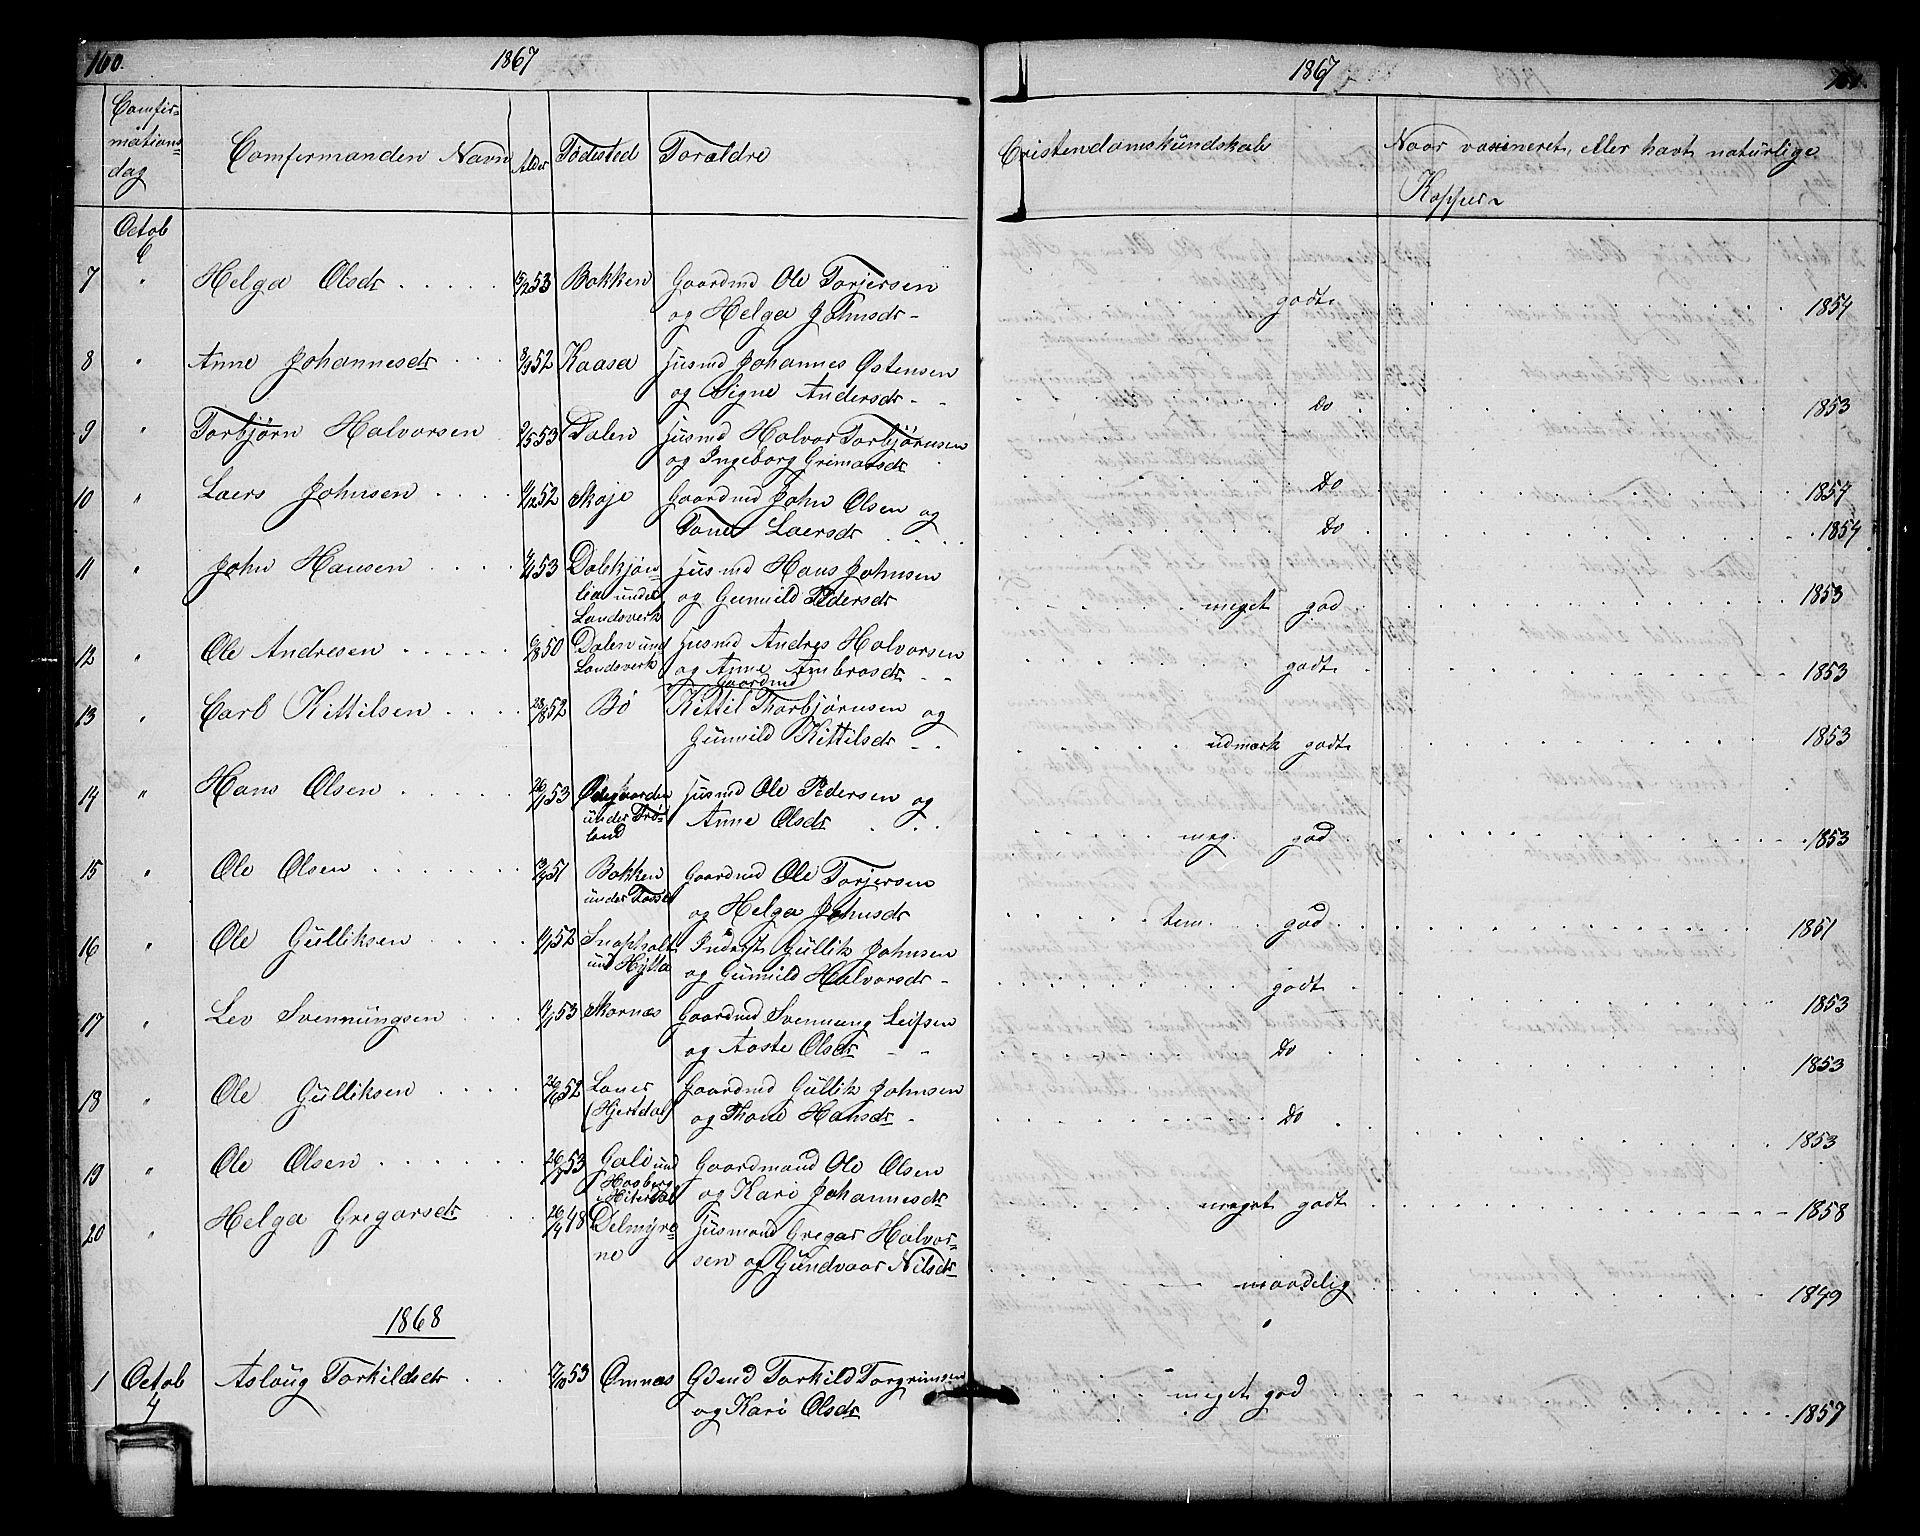 SAKO, Hjartdal kirkebøker, G/Gb/L0002: Klokkerbok nr. II 2, 1854-1884, s. 160-161